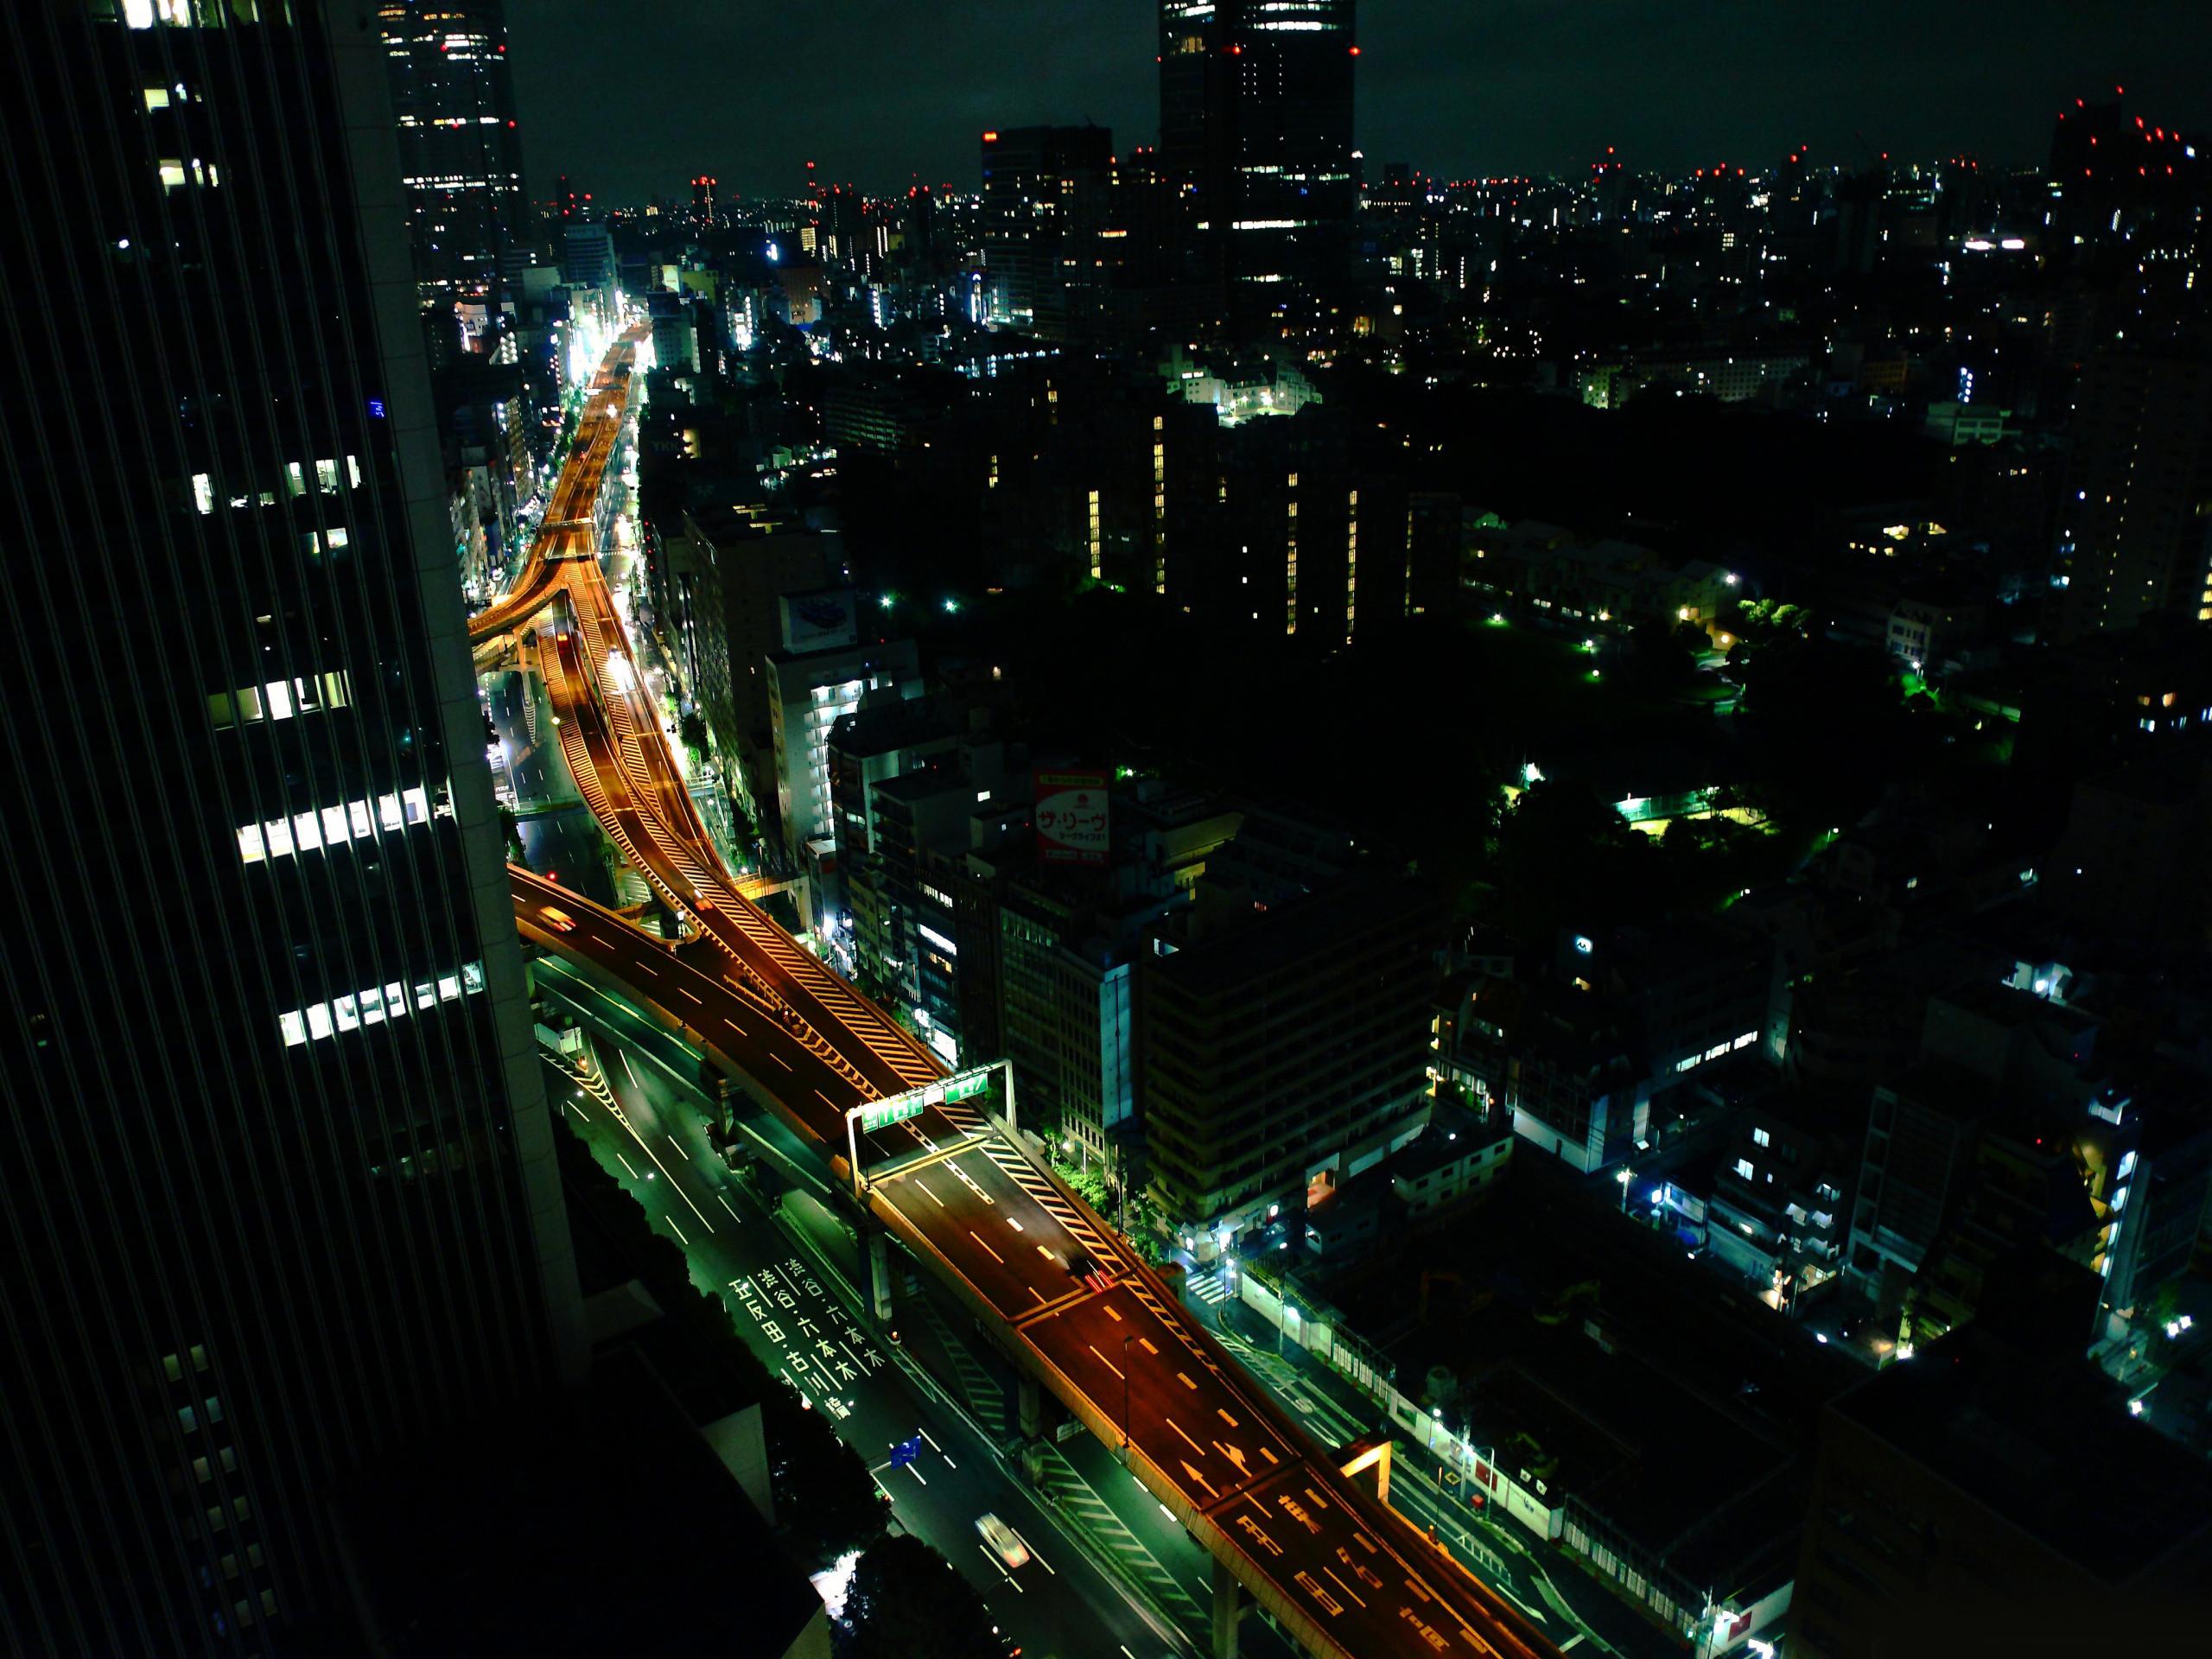 HD Urban Landscape Wallpapers · Street LightsCity LightsTokyo At NightGulliver's  …